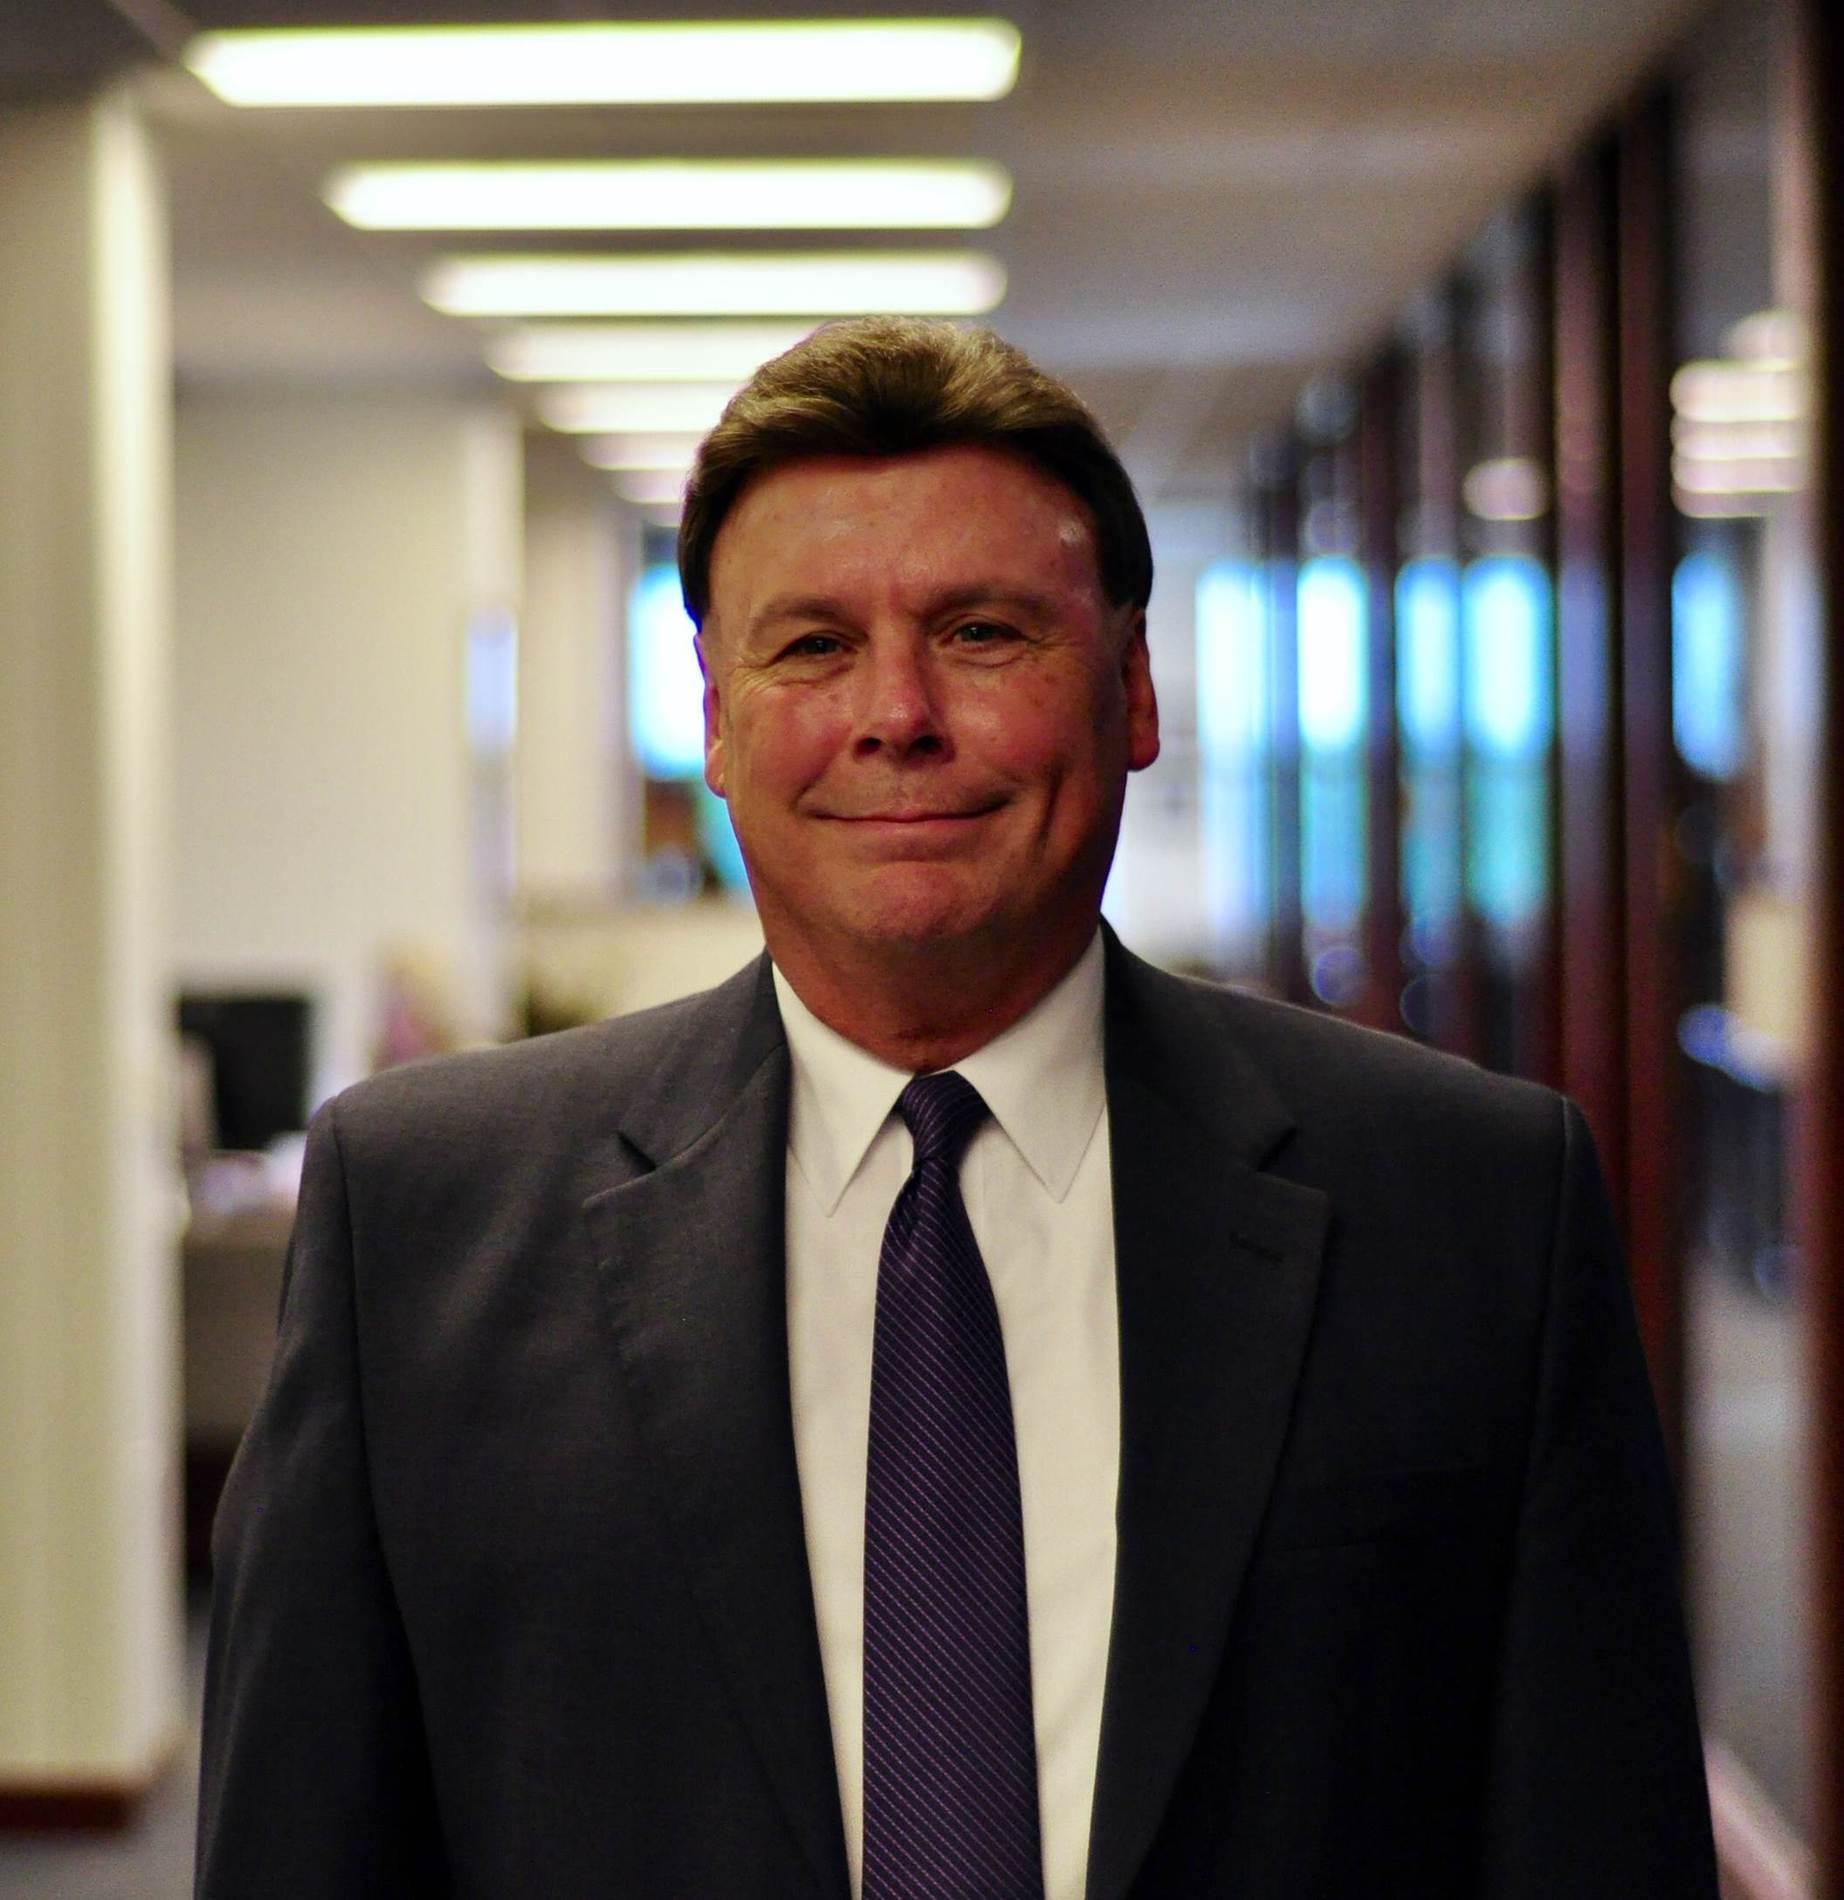 Mark Simon | Green Bay, WI | Morgan Stanley Wealth Management